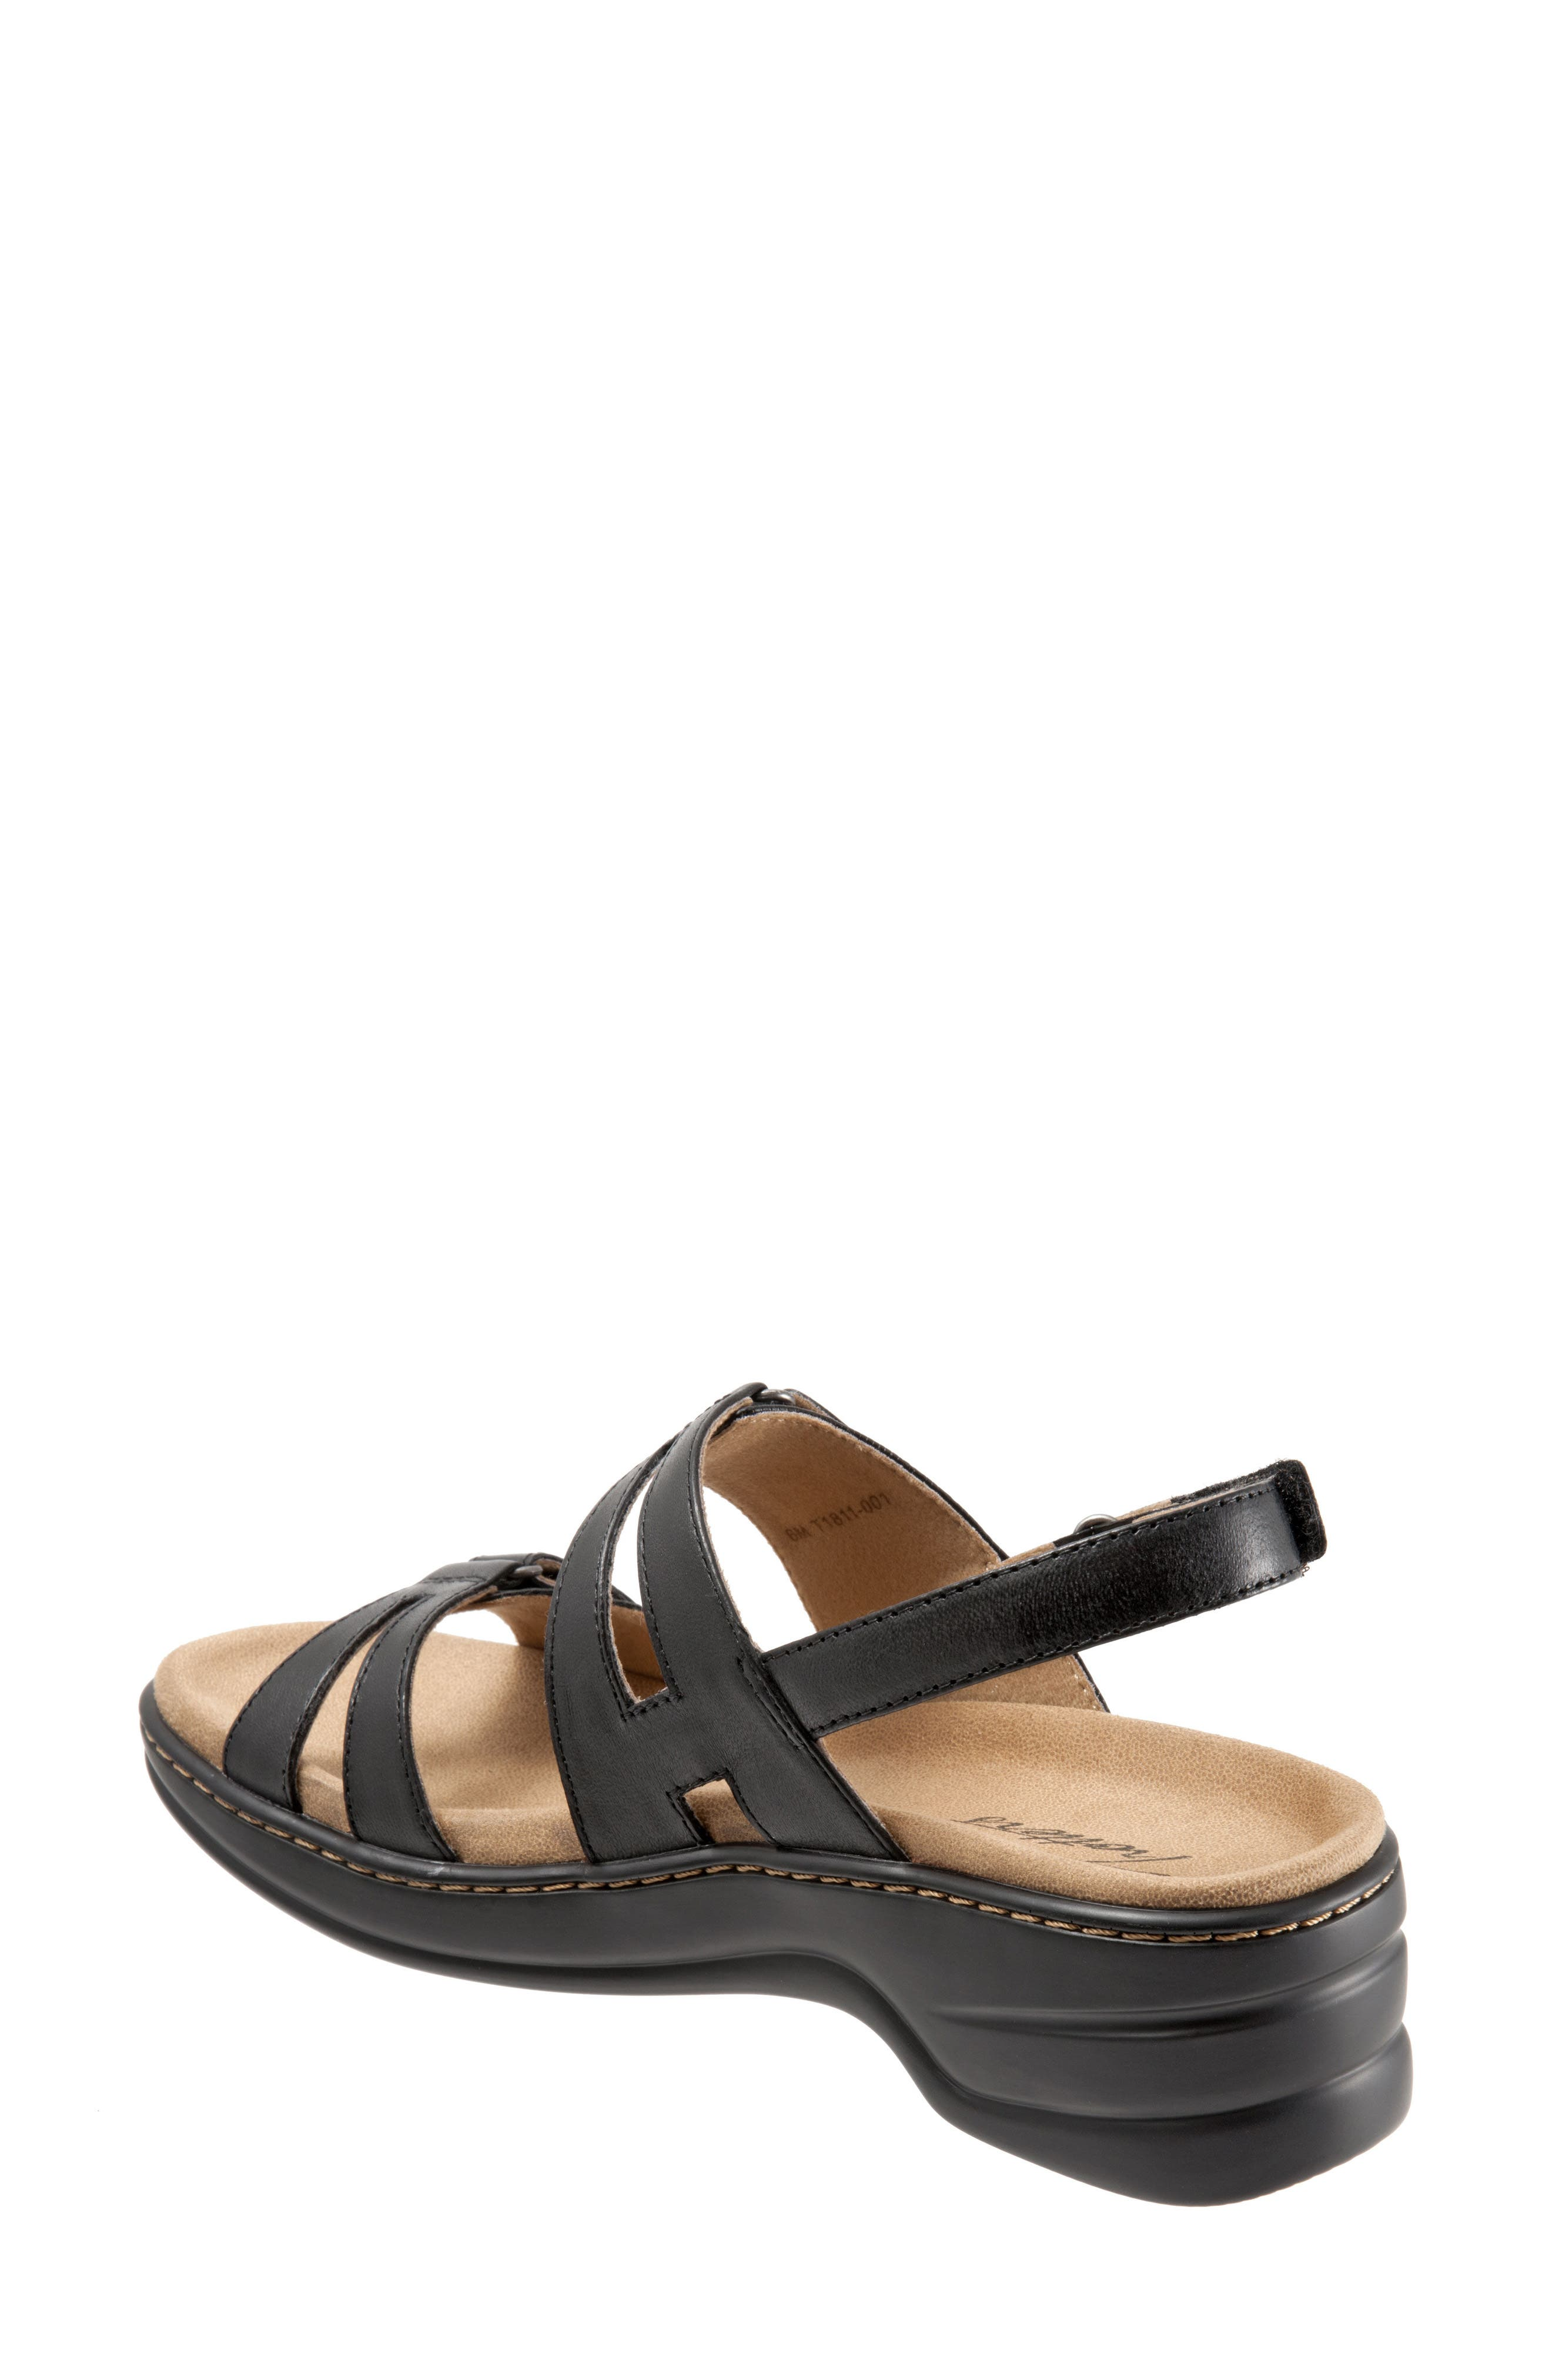 Newton Sandal,                             Alternate thumbnail 2, color,                             BLACK LEATHER